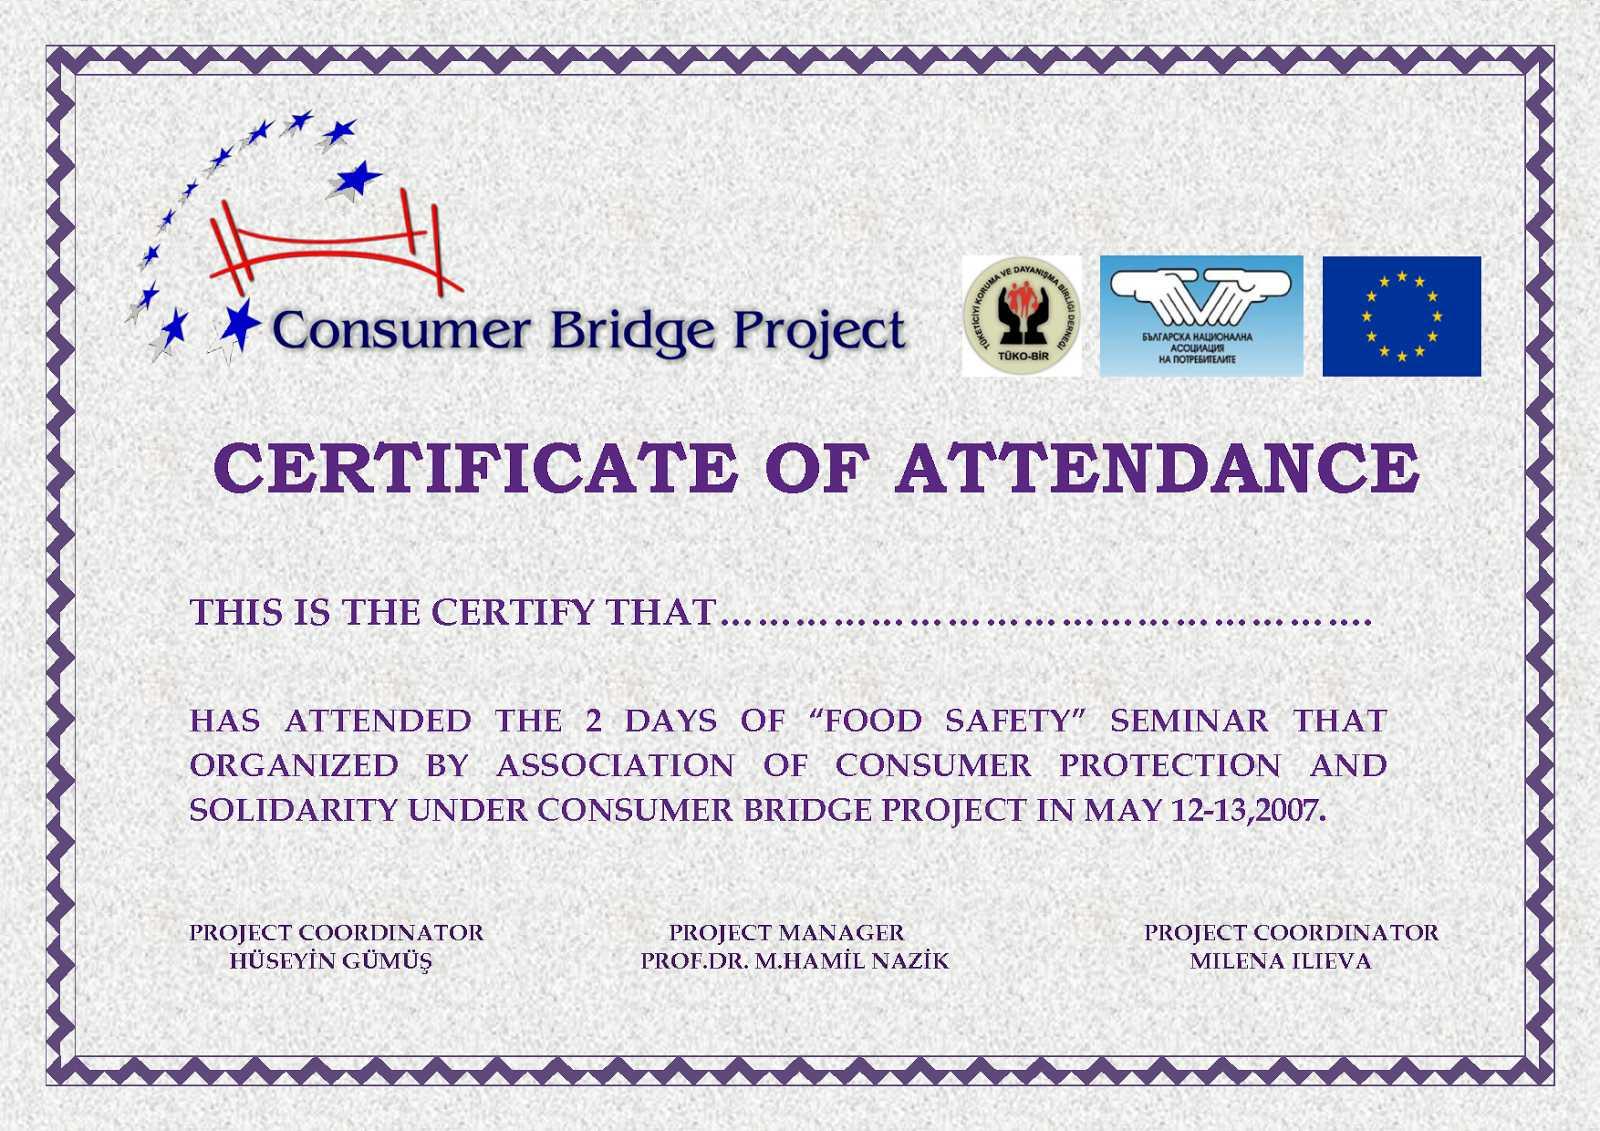 Attendance Certificate Template Free - Karati.ald2014 For Conference Certificate Of Attendance Template